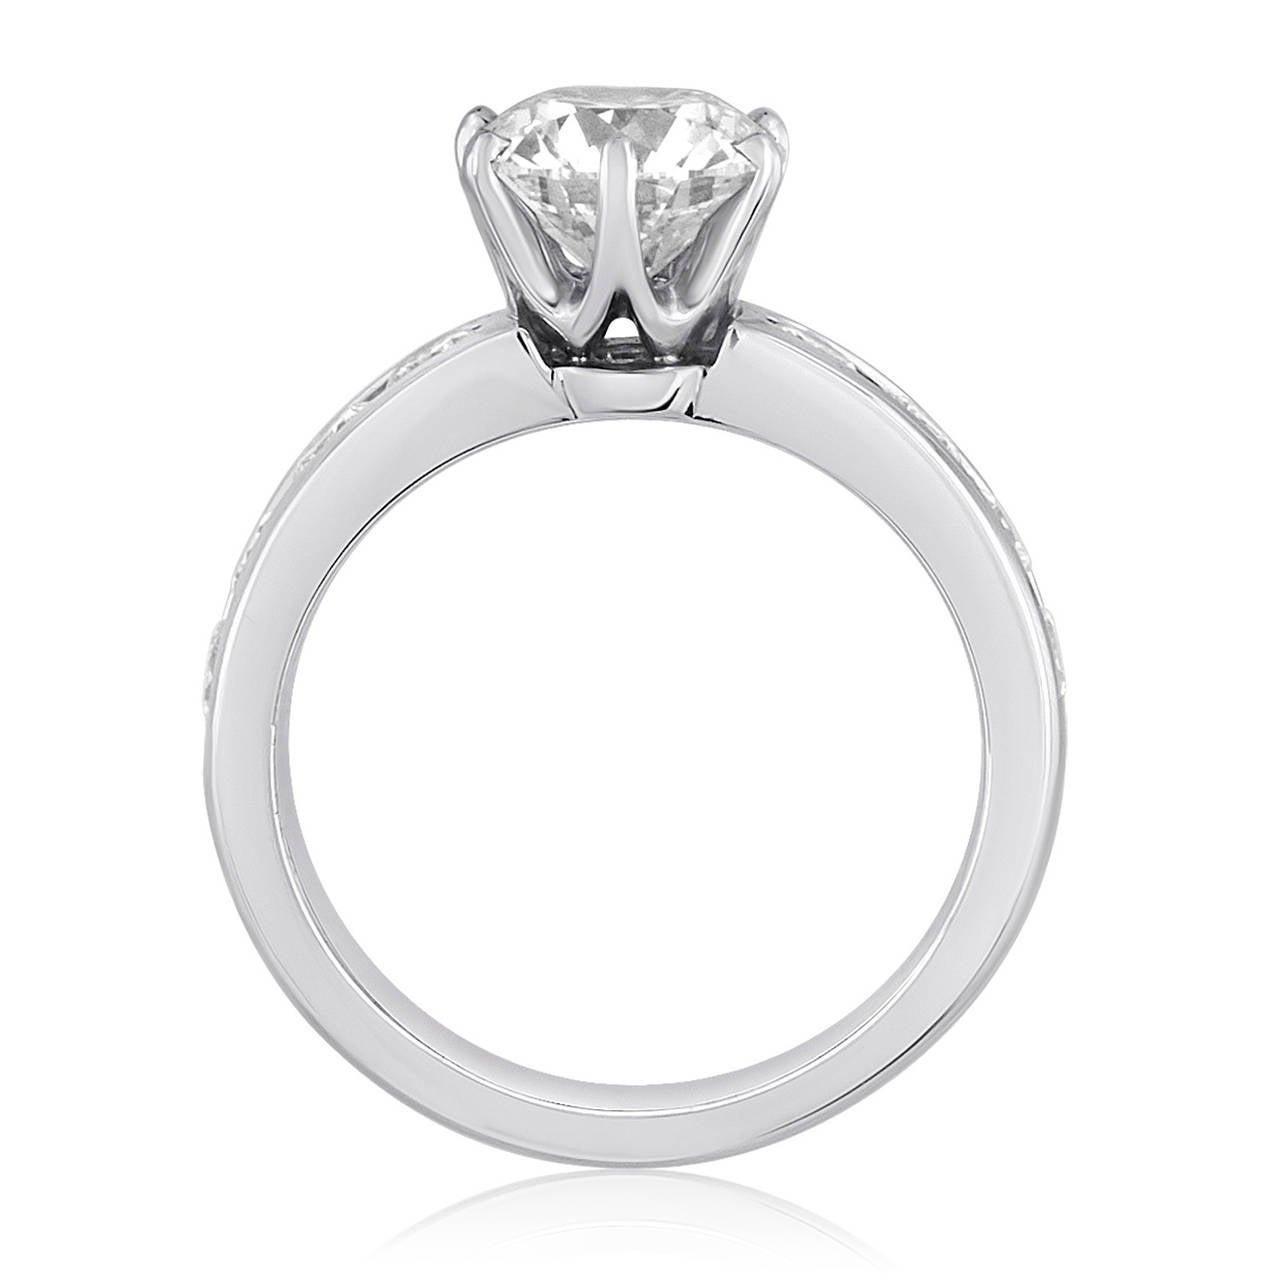 Tiffany & Co. 1.71 Carat F IF Diamond Platinum Ring 4